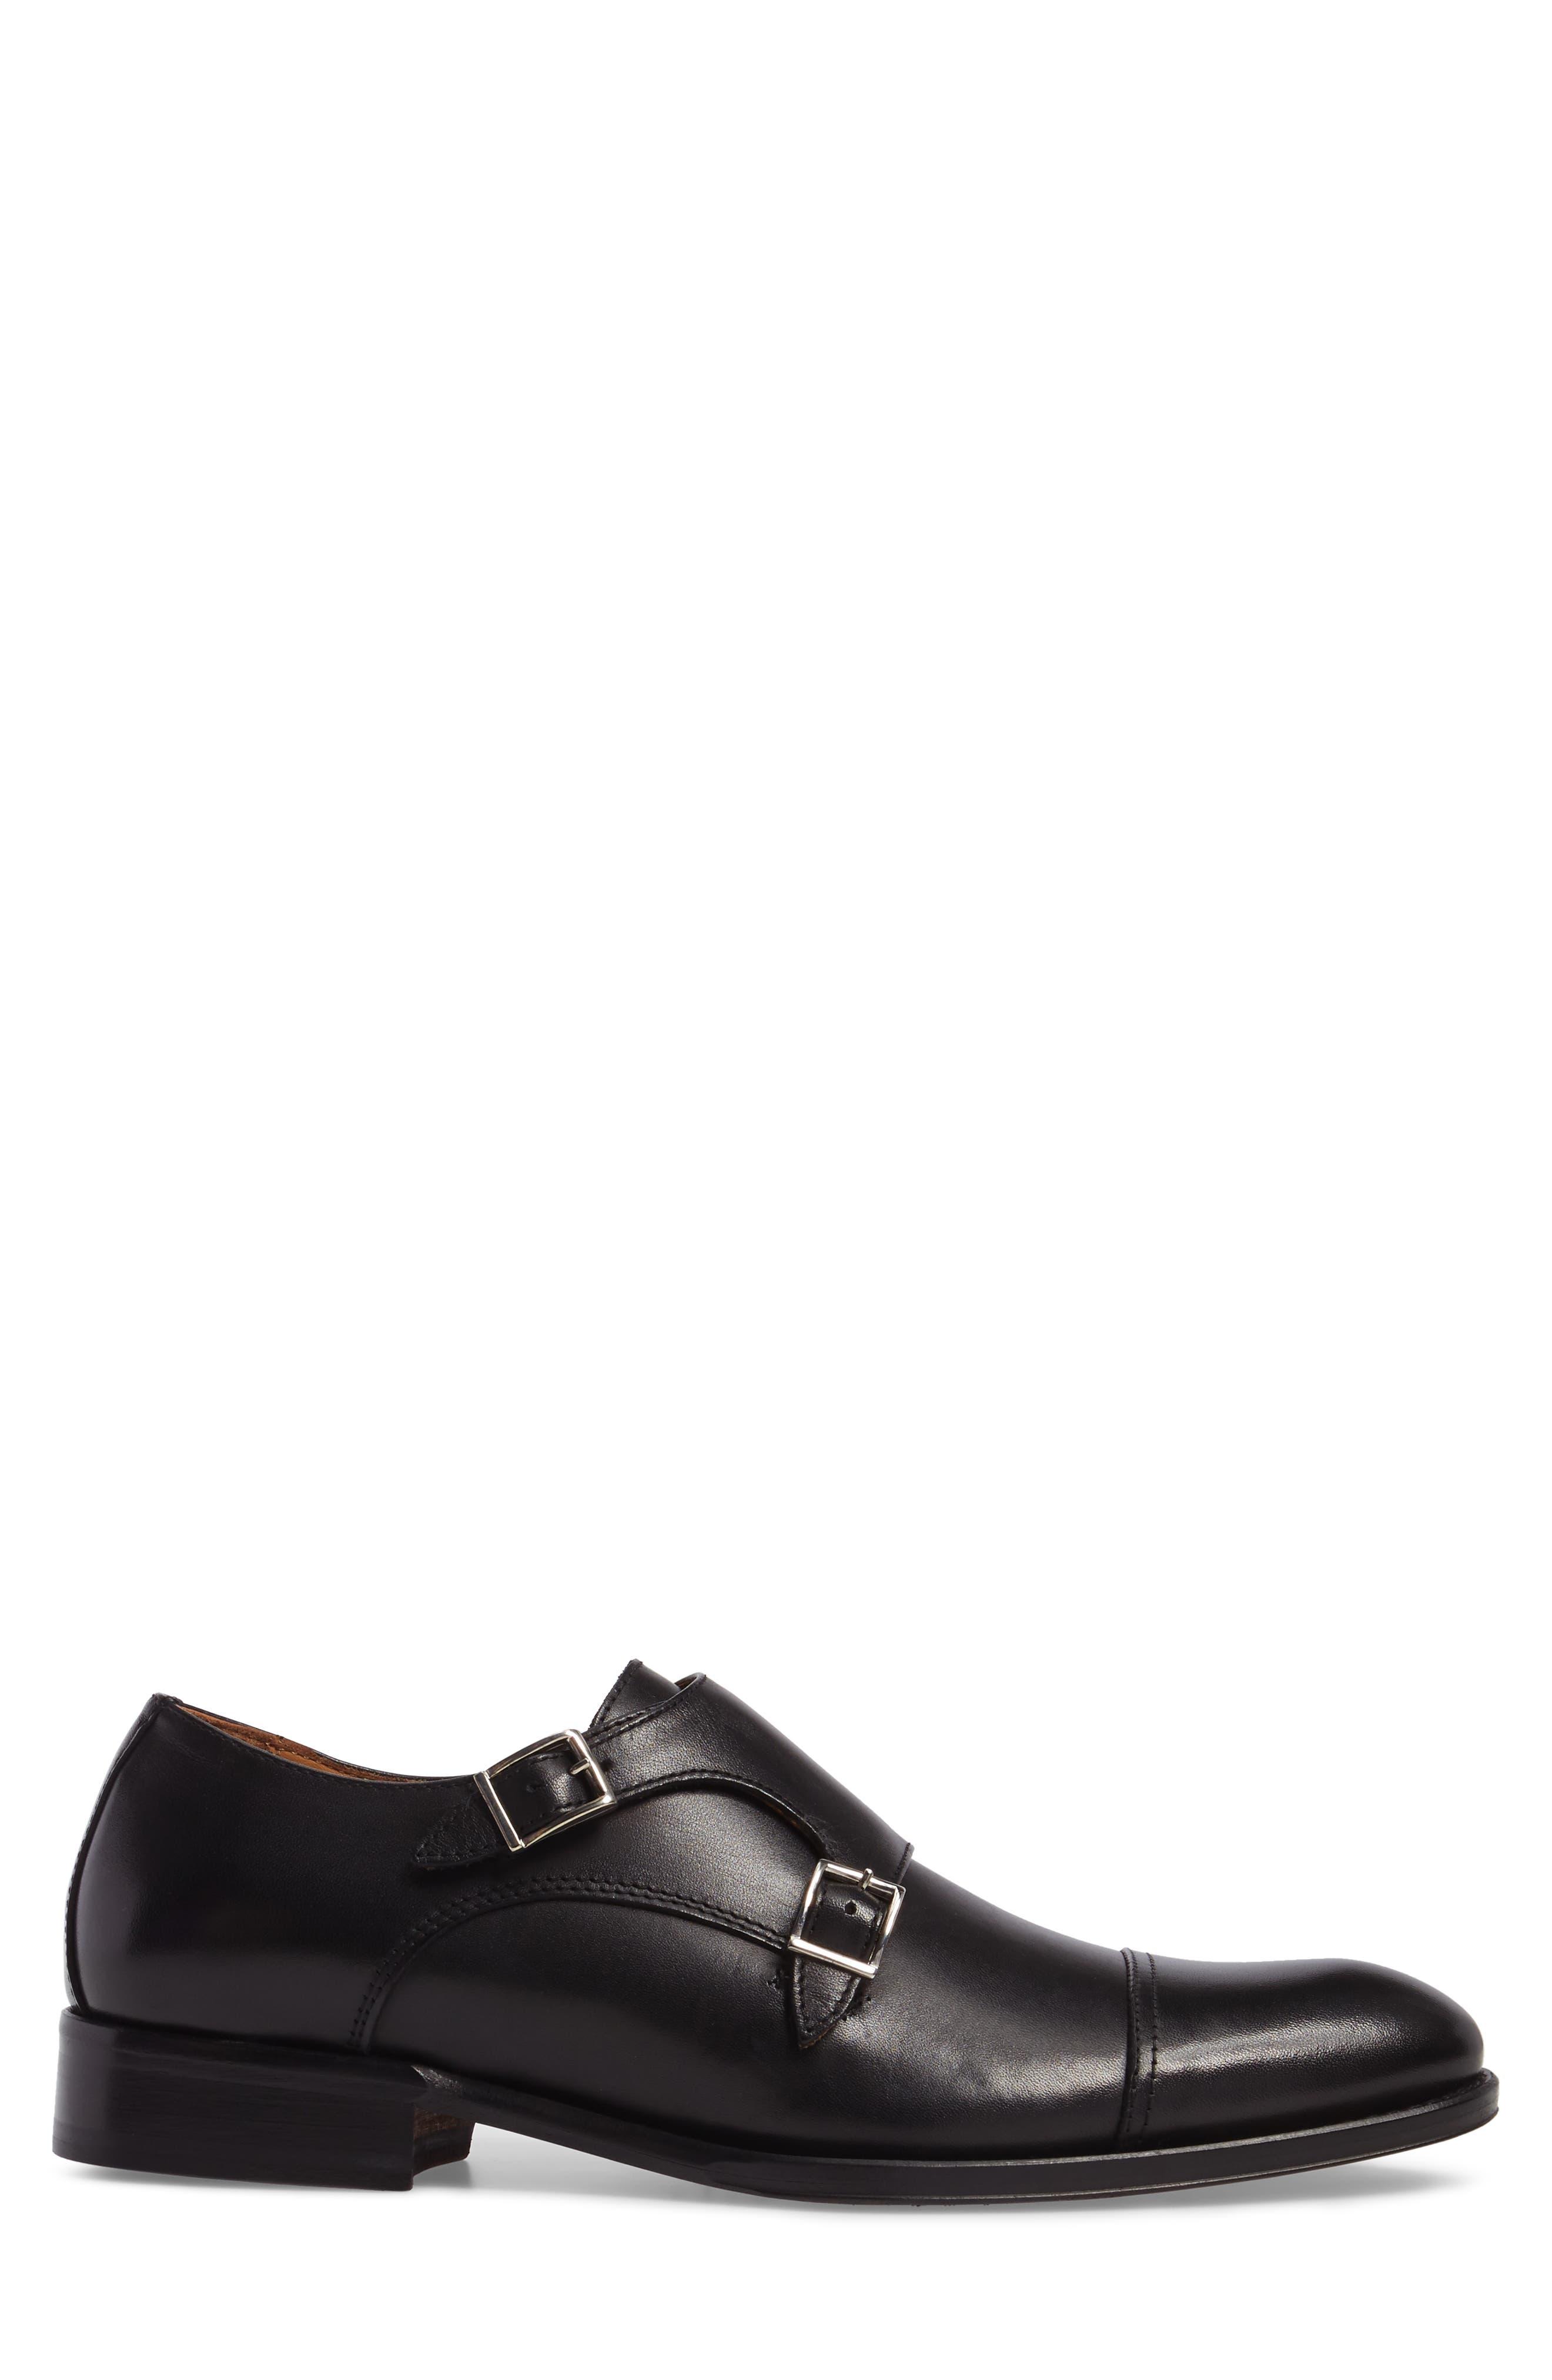 Stratton Double Monk Strap Shoe,                             Alternate thumbnail 3, color,                             001